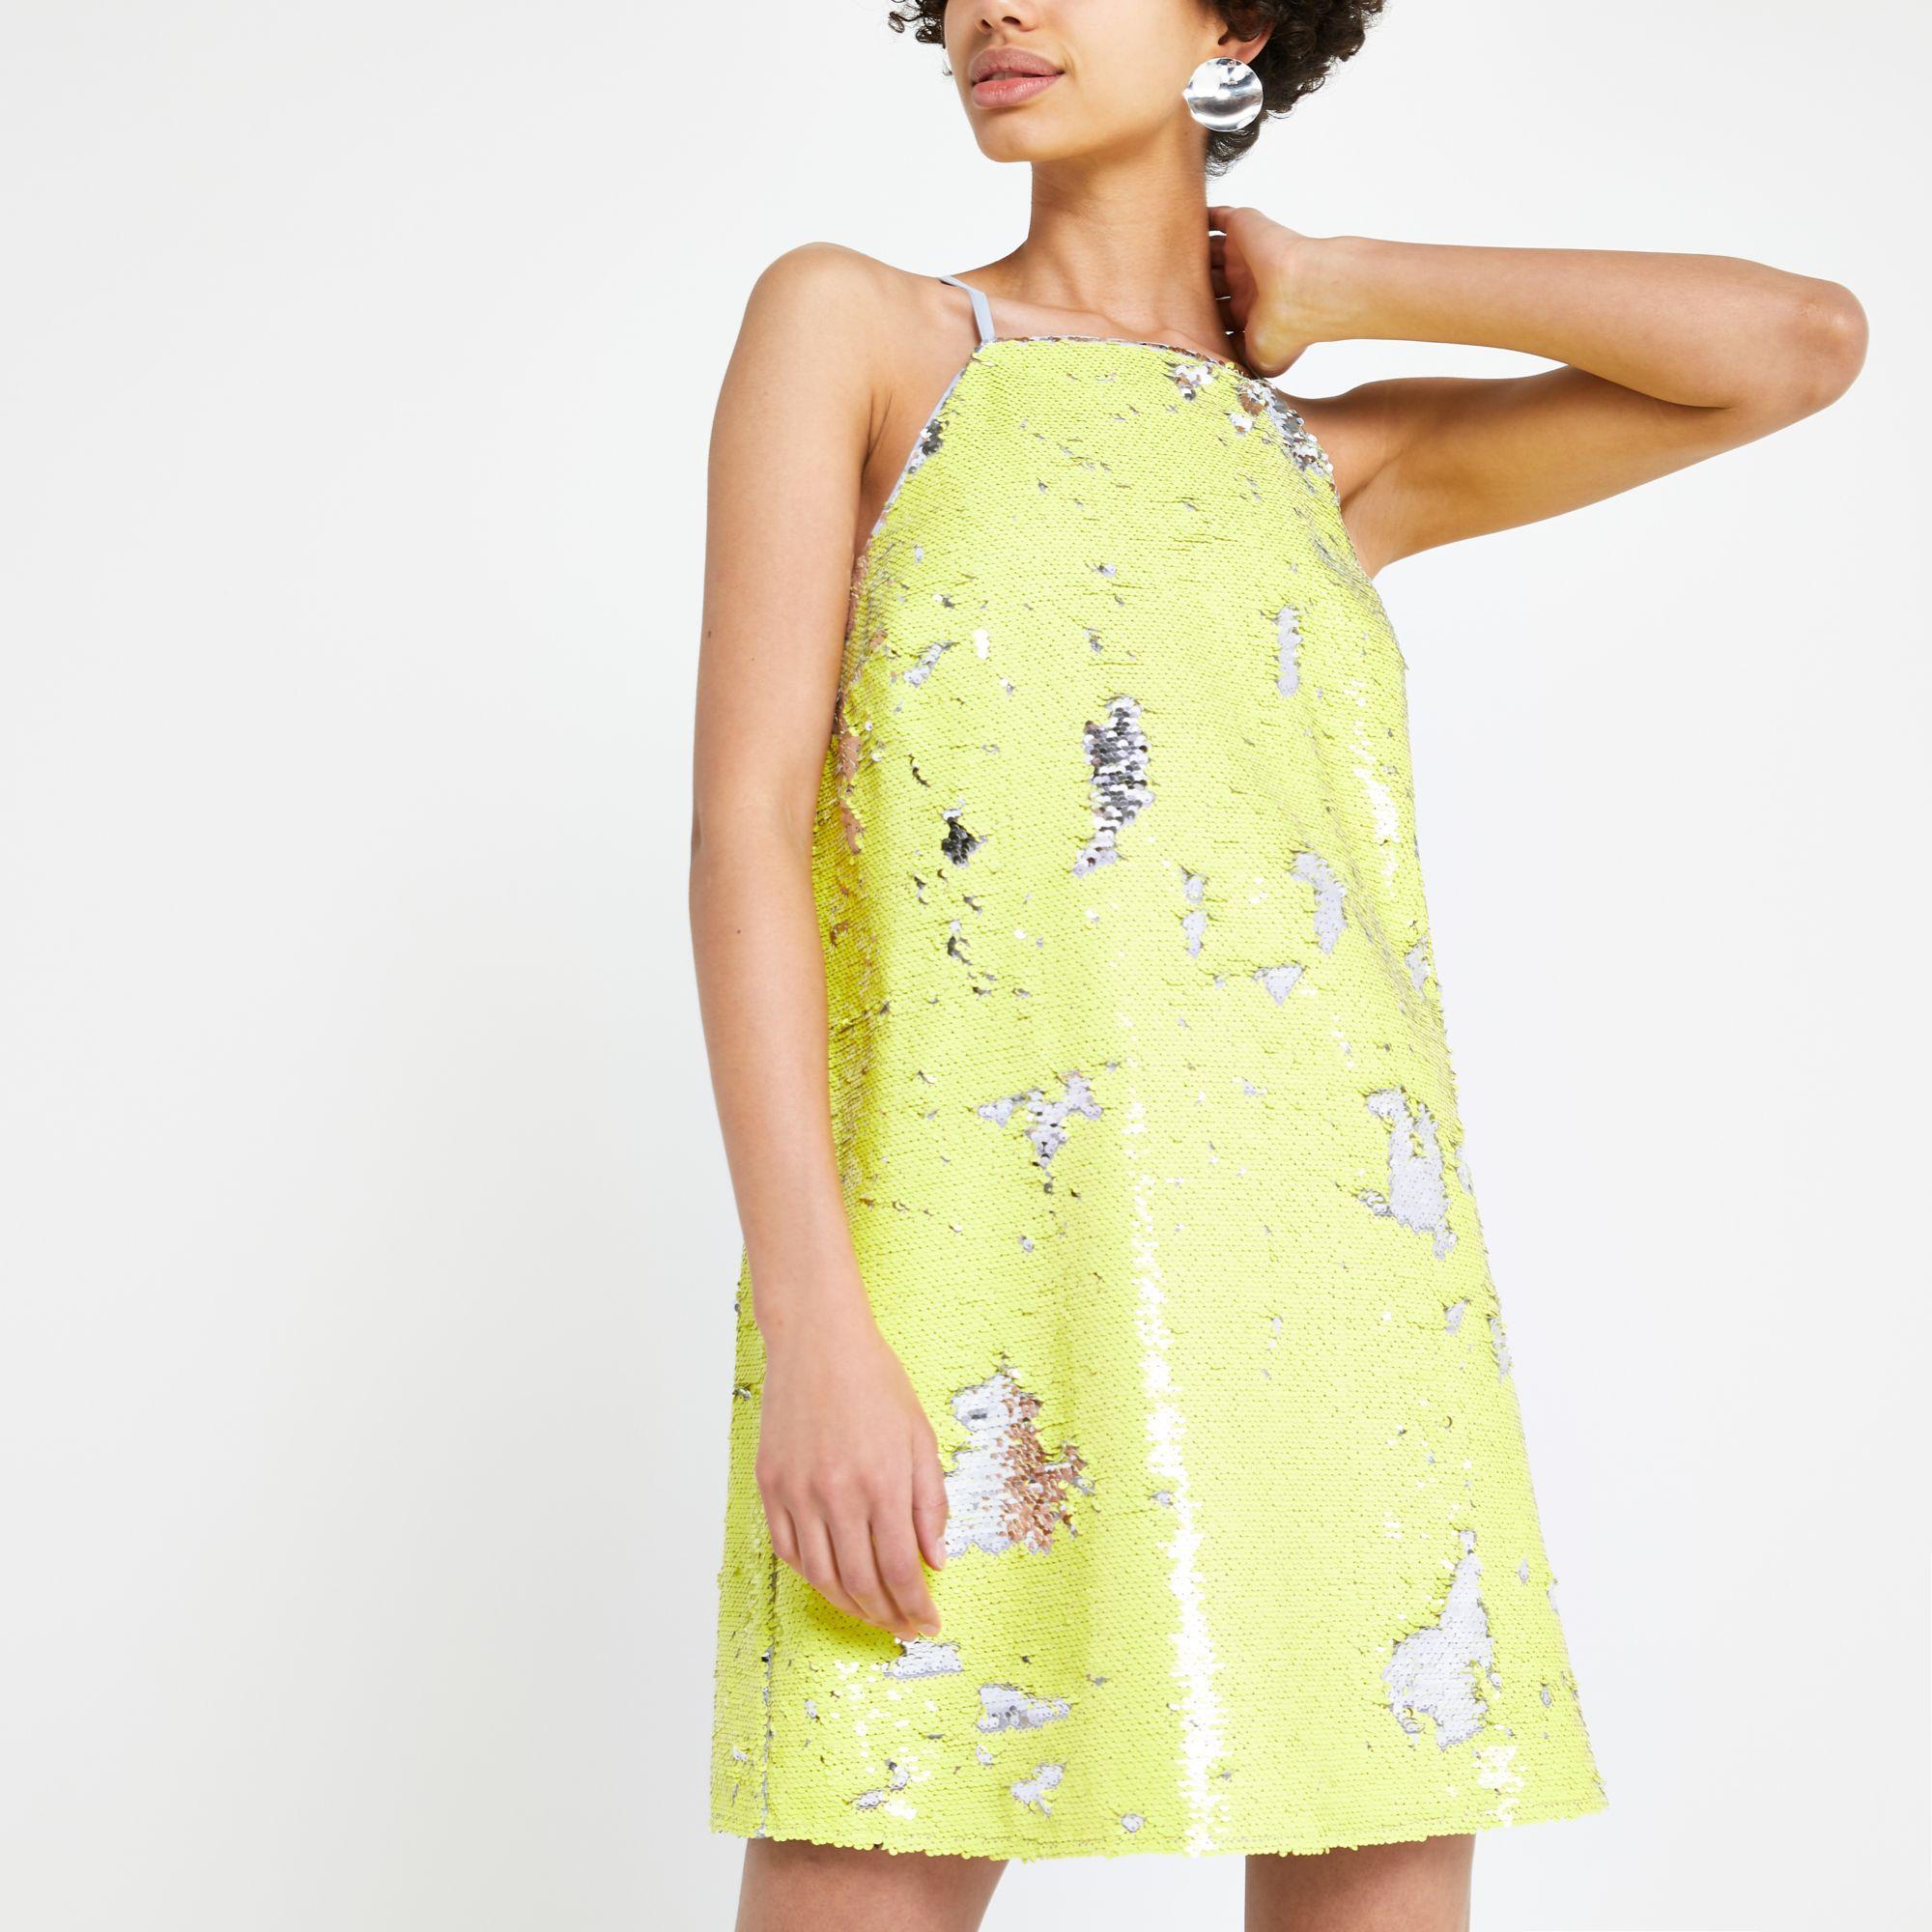 9c28acef356e Lyst - River Island Yellow Sequin Slip Dress in Yellow